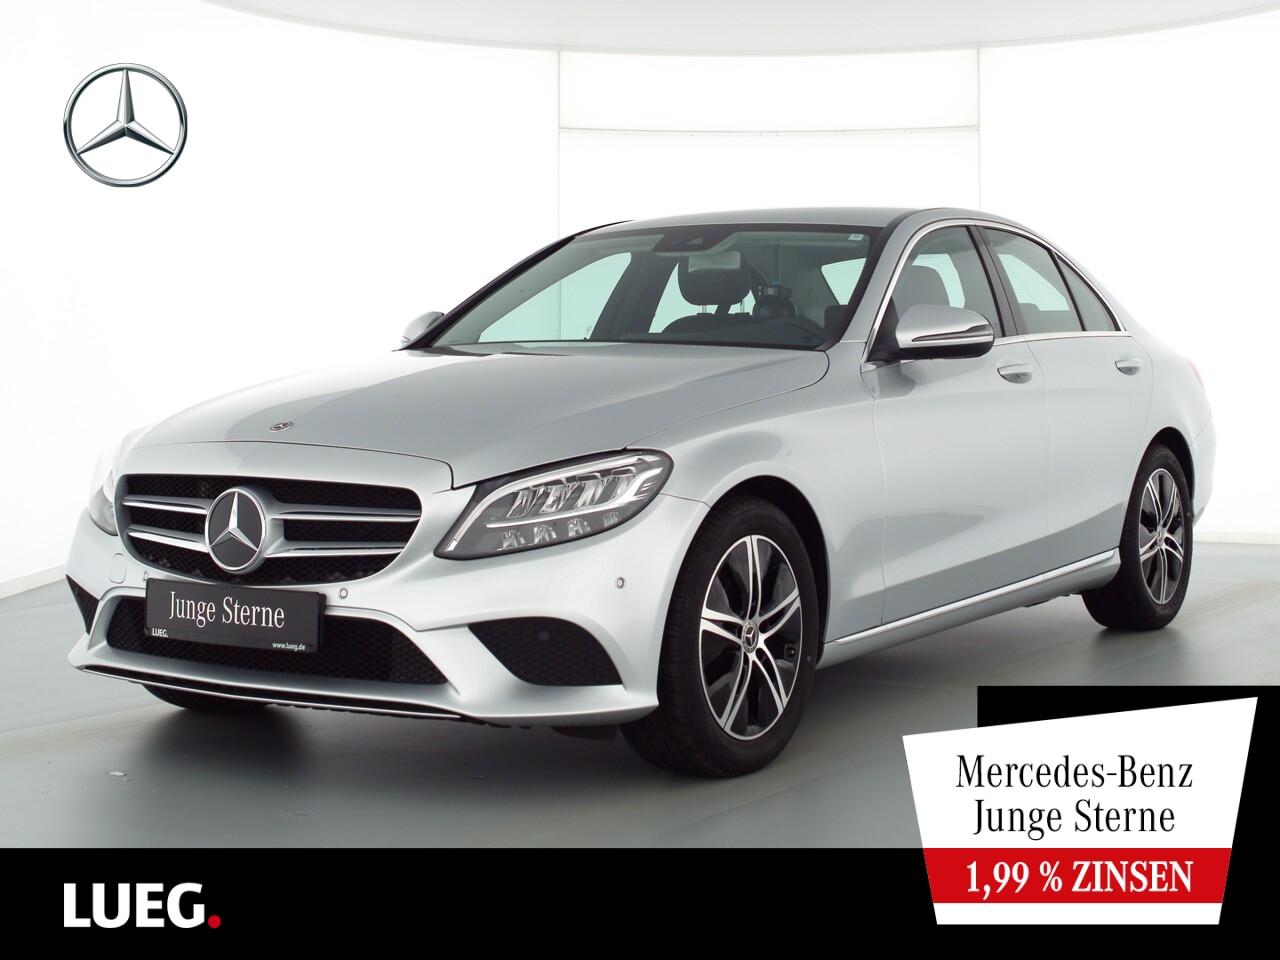 Mercedes-Benz C 180 Avantgarde+Navi+LED-HP+SpurP+ParkAs+Kamera, Jahr 2020, Benzin